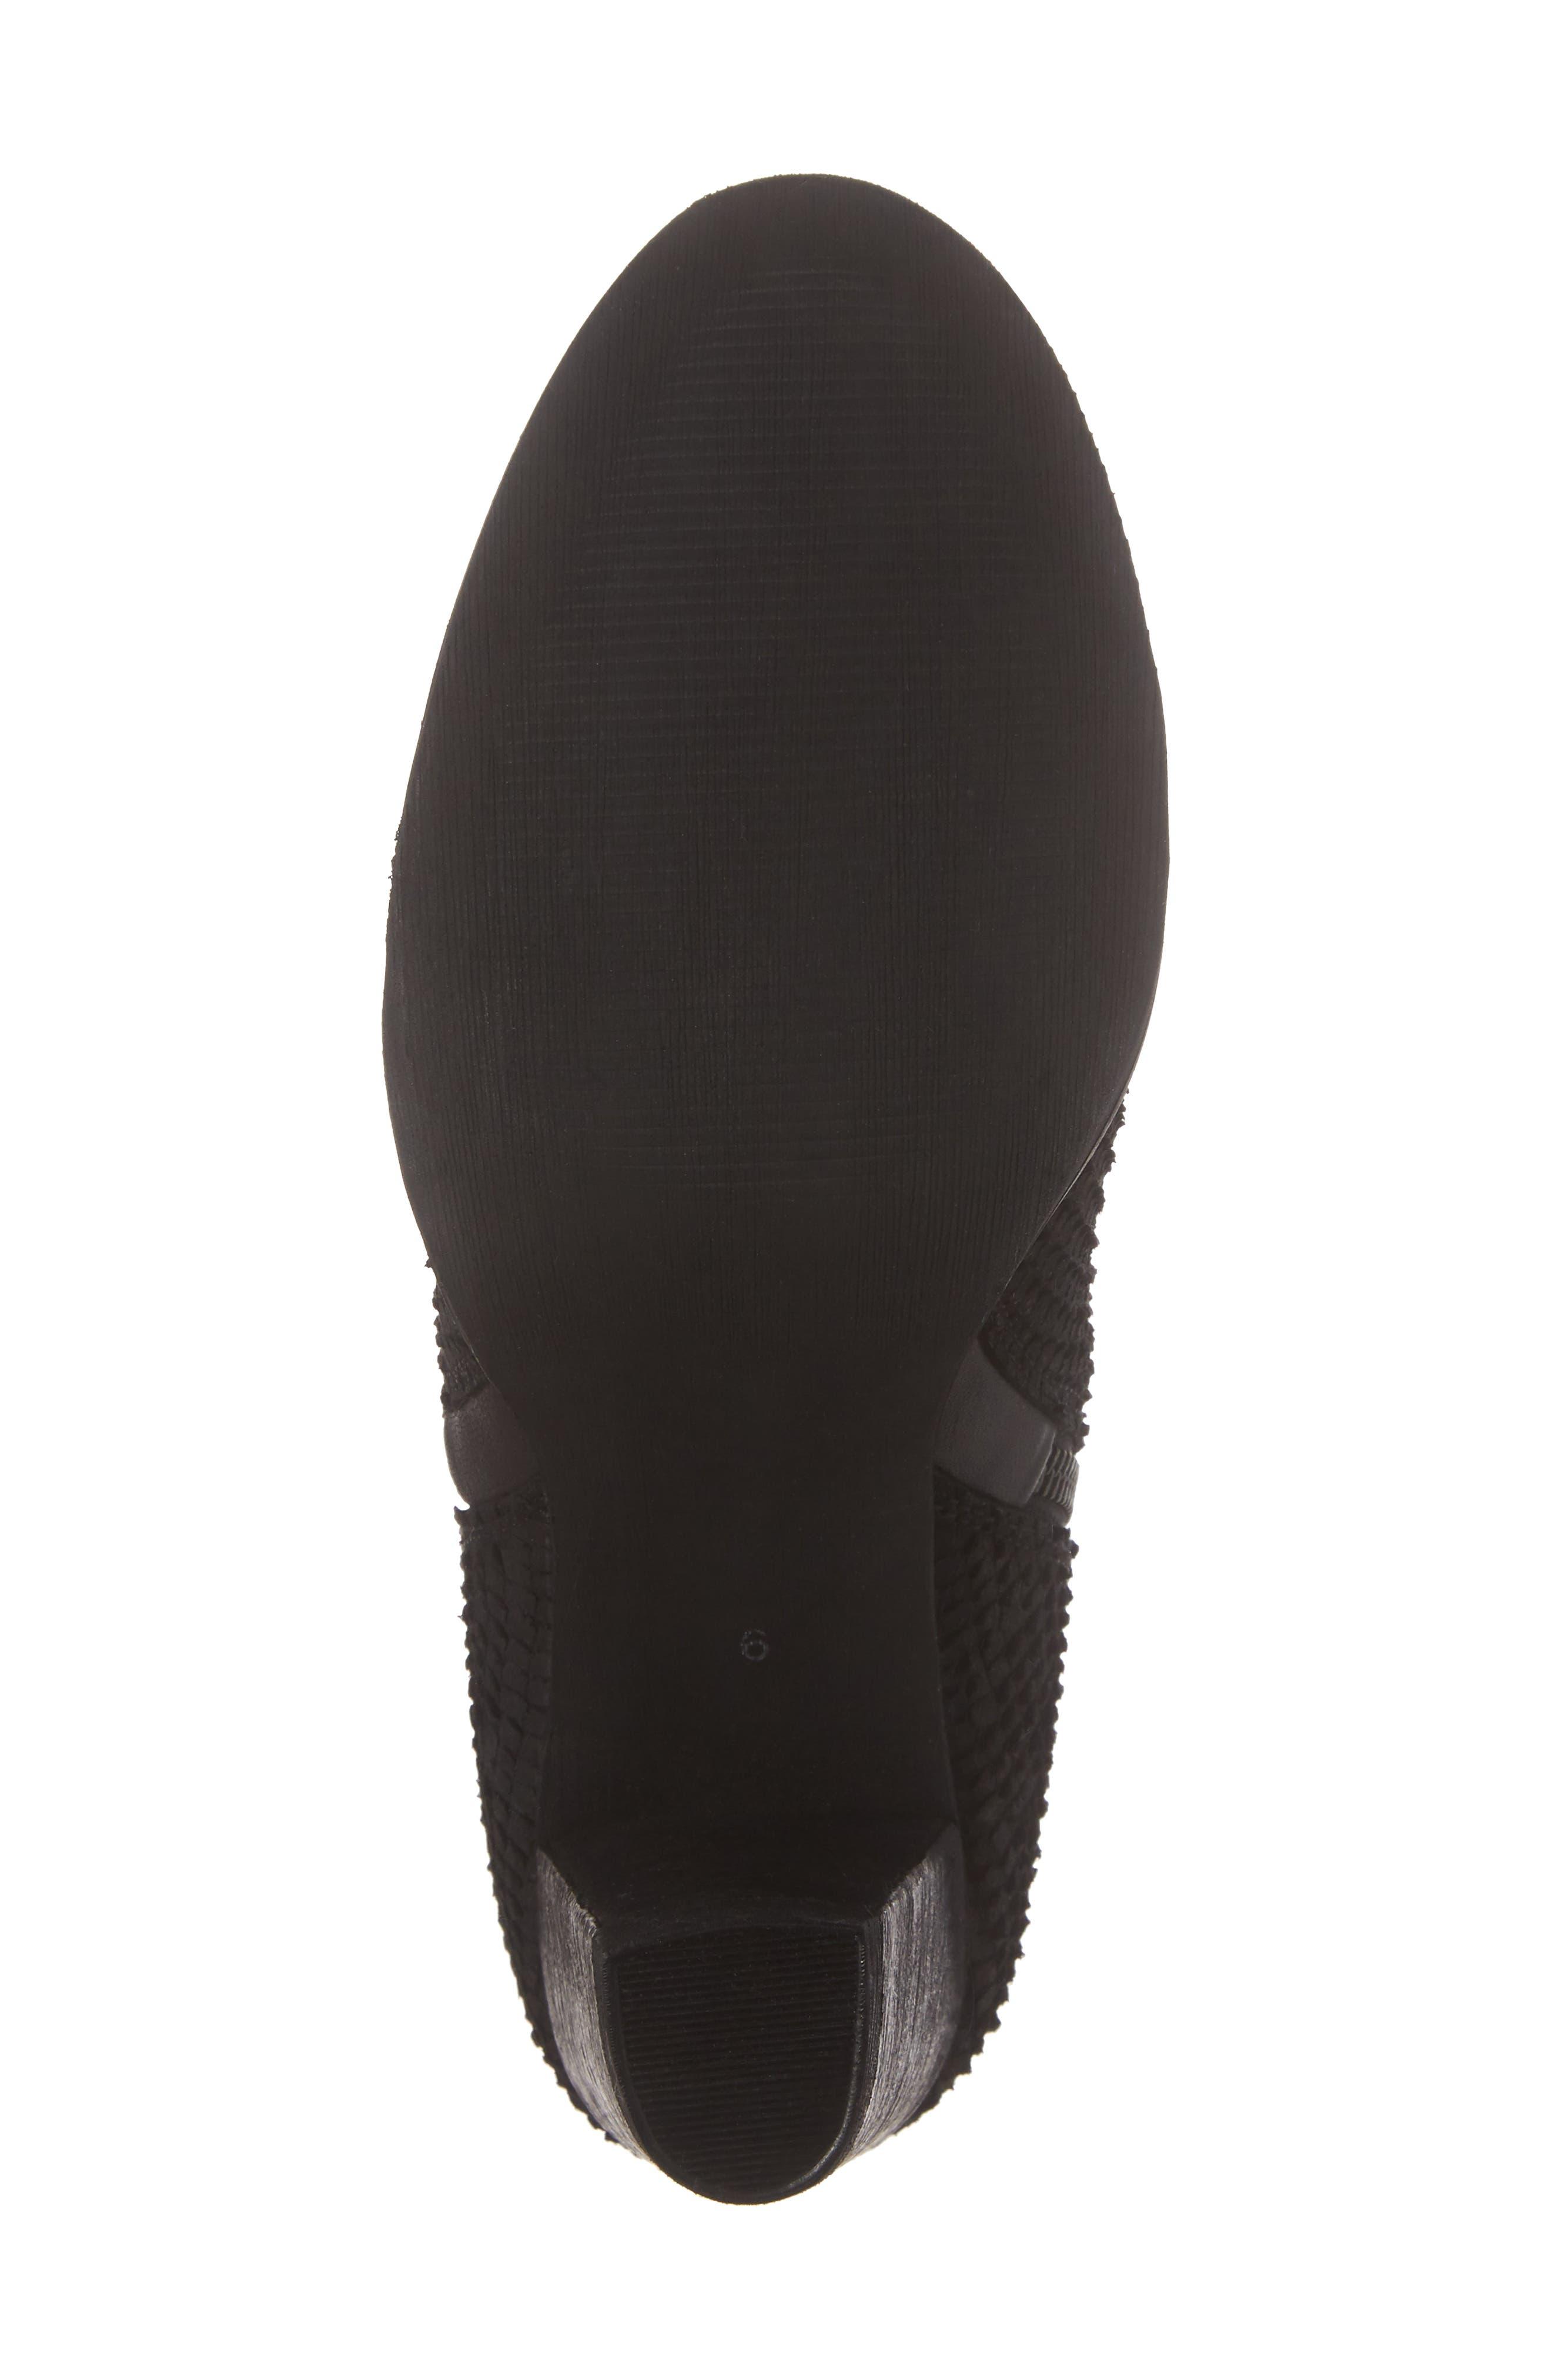 Maddock Block Heel Bootie,                             Alternate thumbnail 6, color,                             BLACK/ BLACK